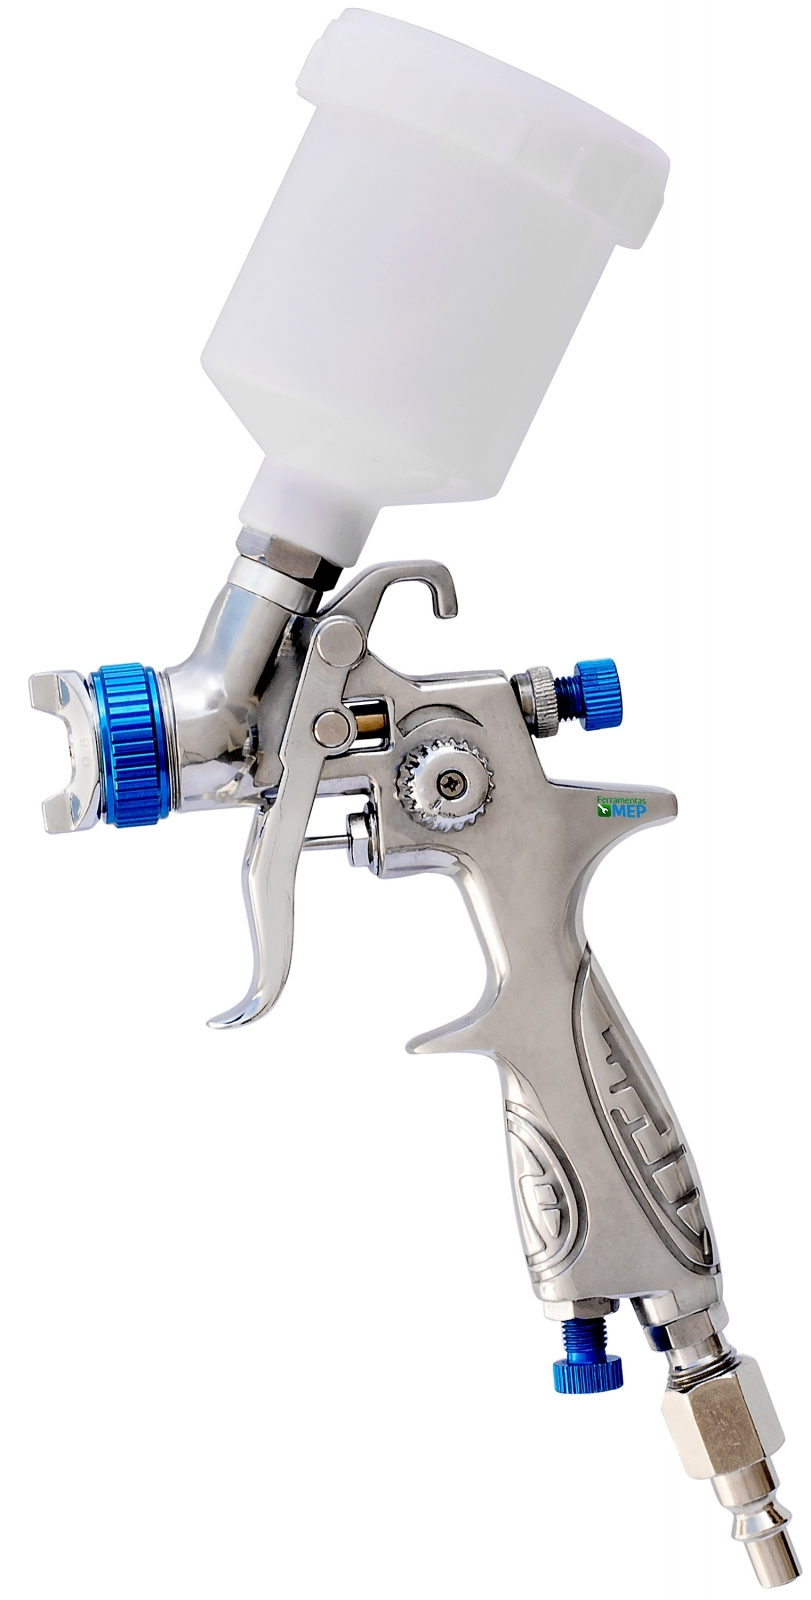 Pistola De Pintura Mini Hvlp PDR Pro-535 Bico 0,8mm Pi1 - Ferramentas MEP